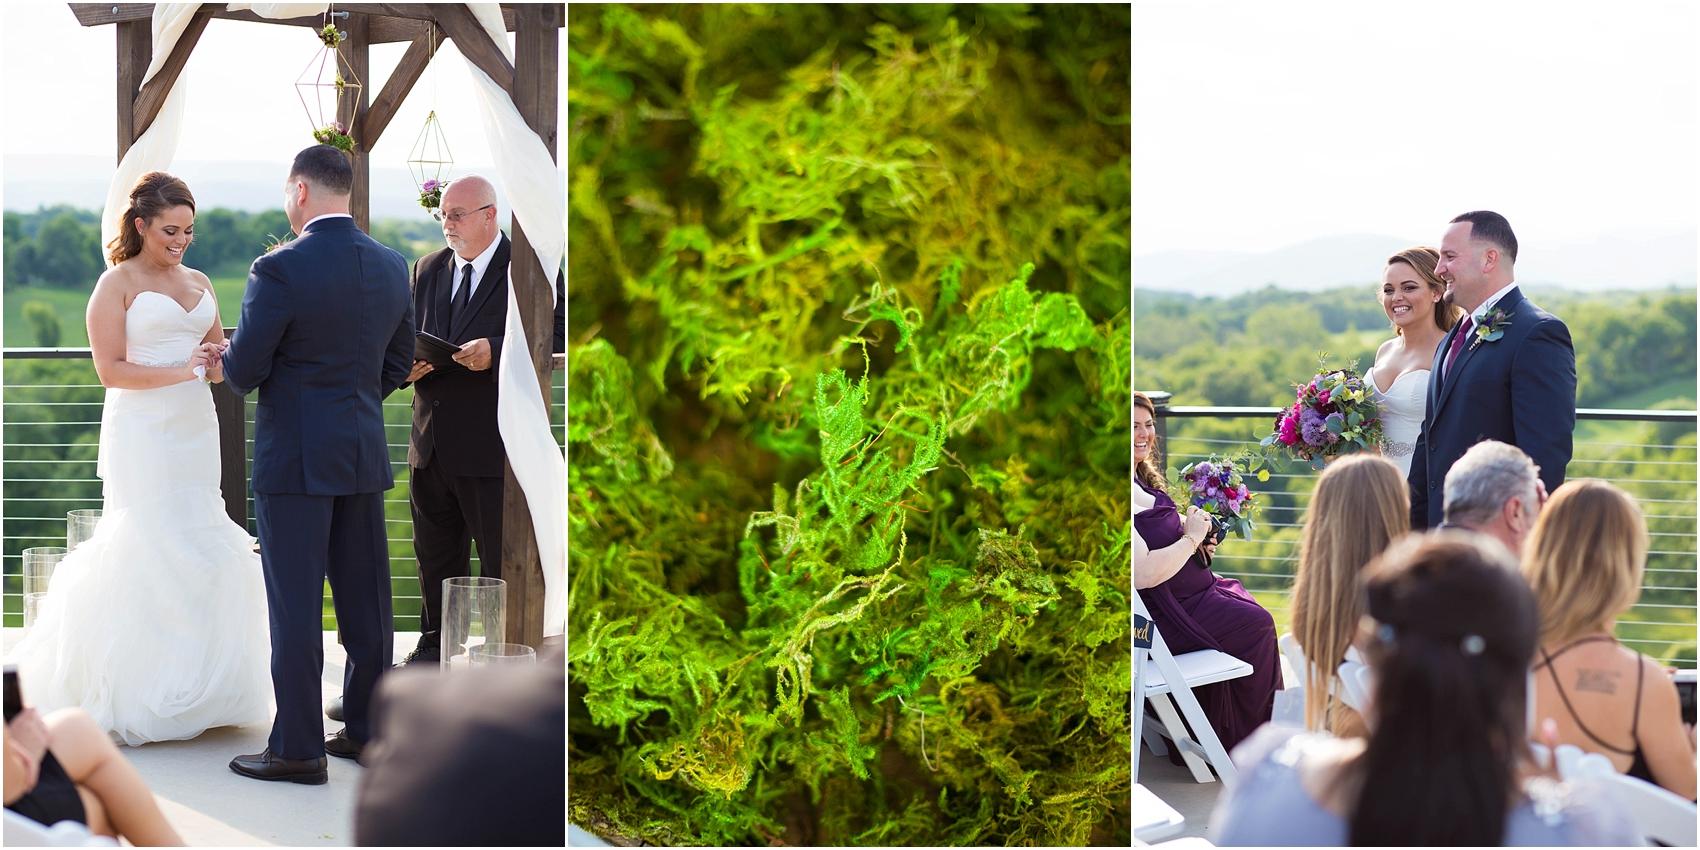 Blue Valley Winery Wedding Feather n Oak Photography_0035.jpg